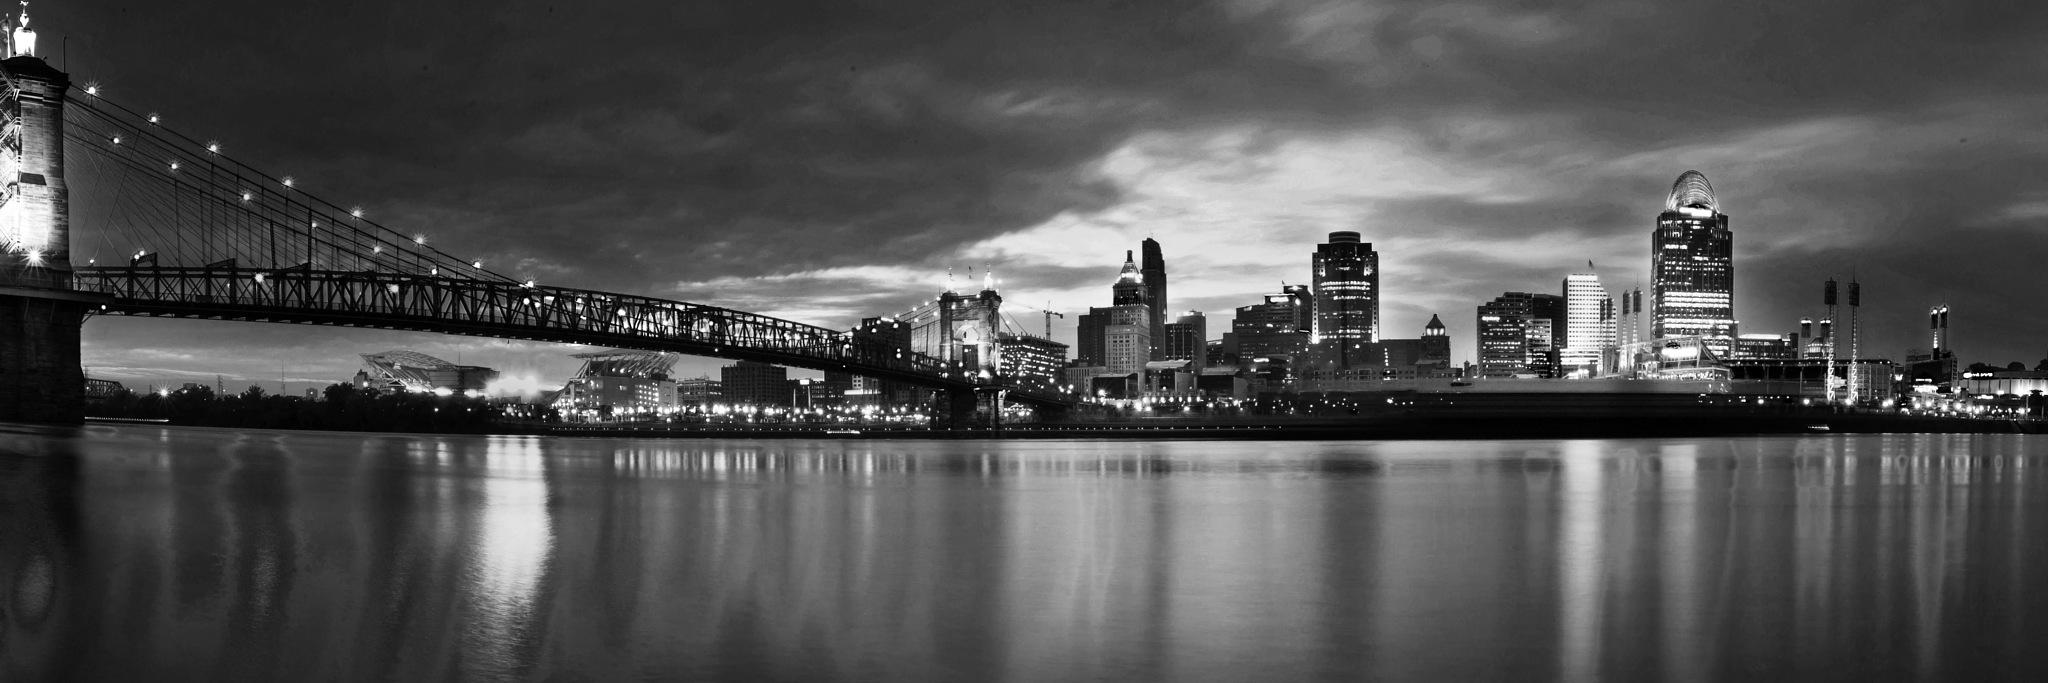 Cincinnati Skyline by AmanPhotos